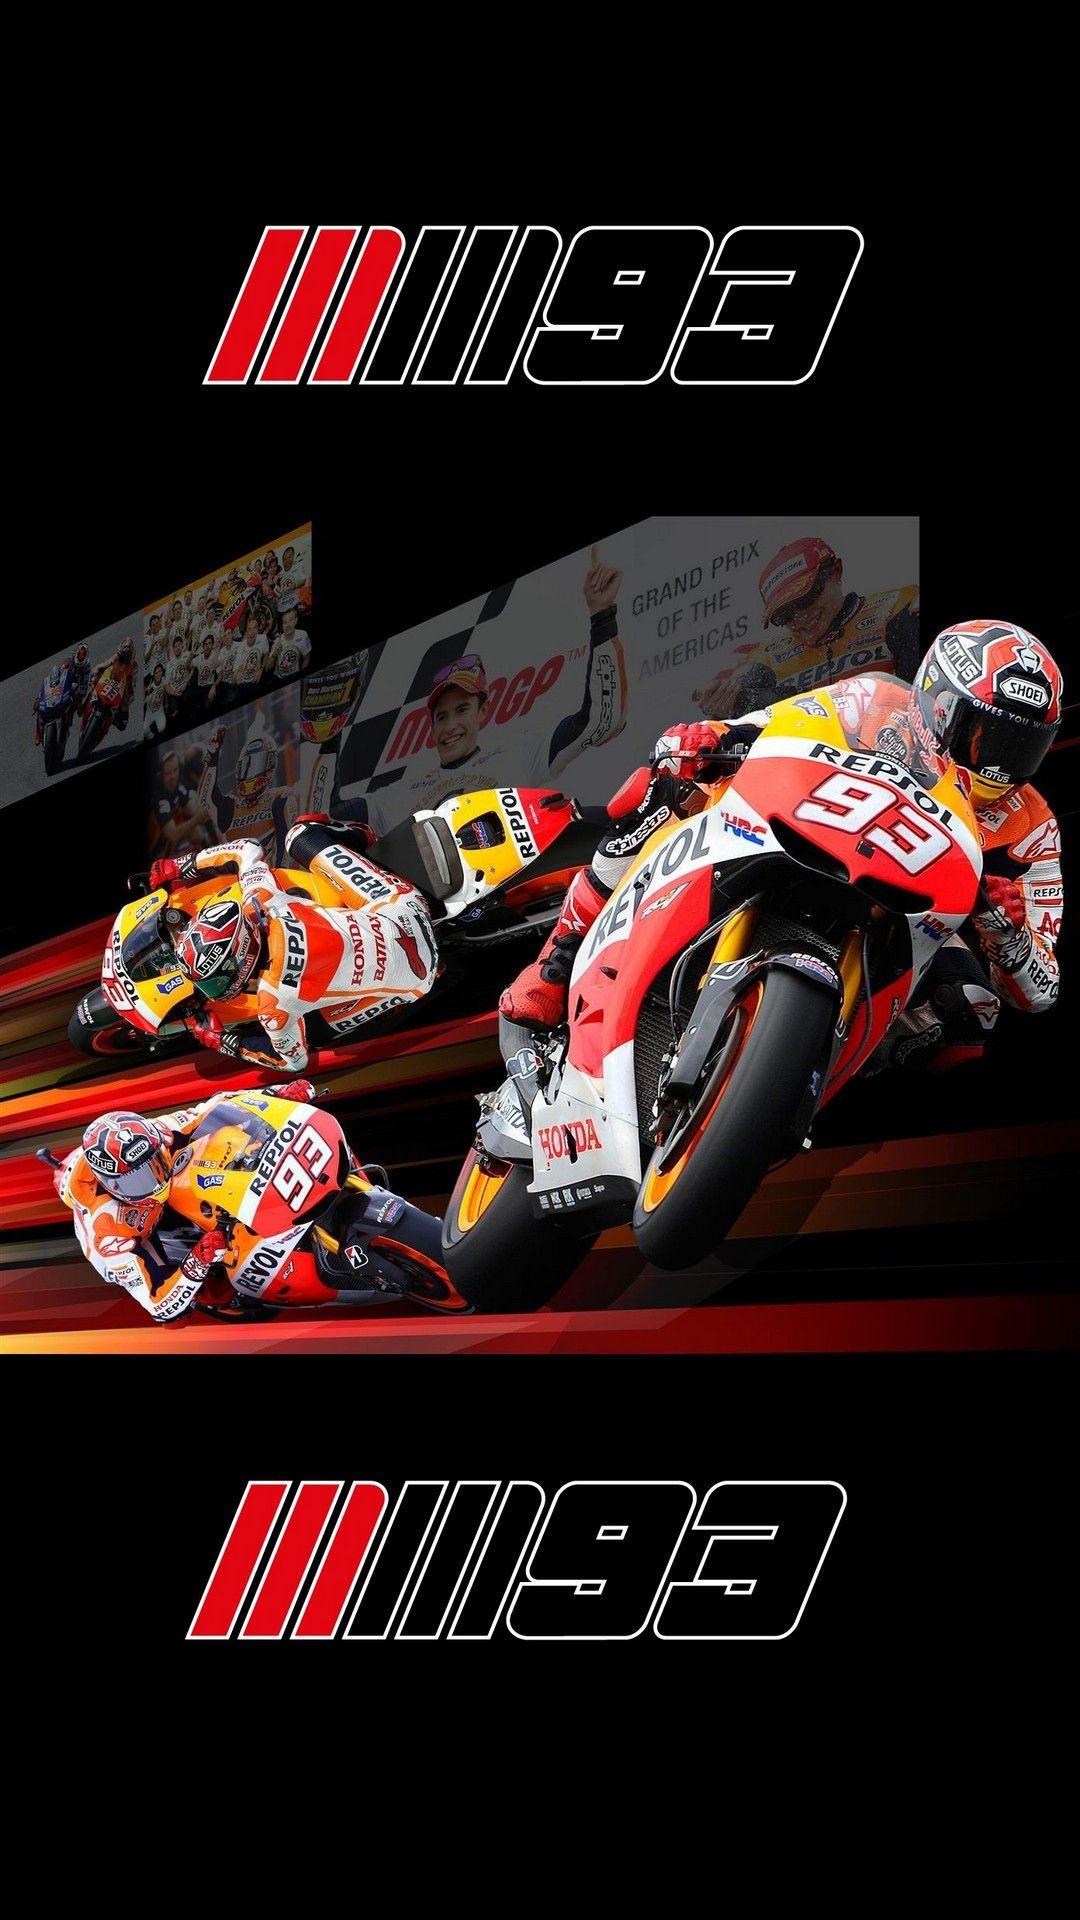 Marc Marquez World Champion Motogp Wallpaper best is high